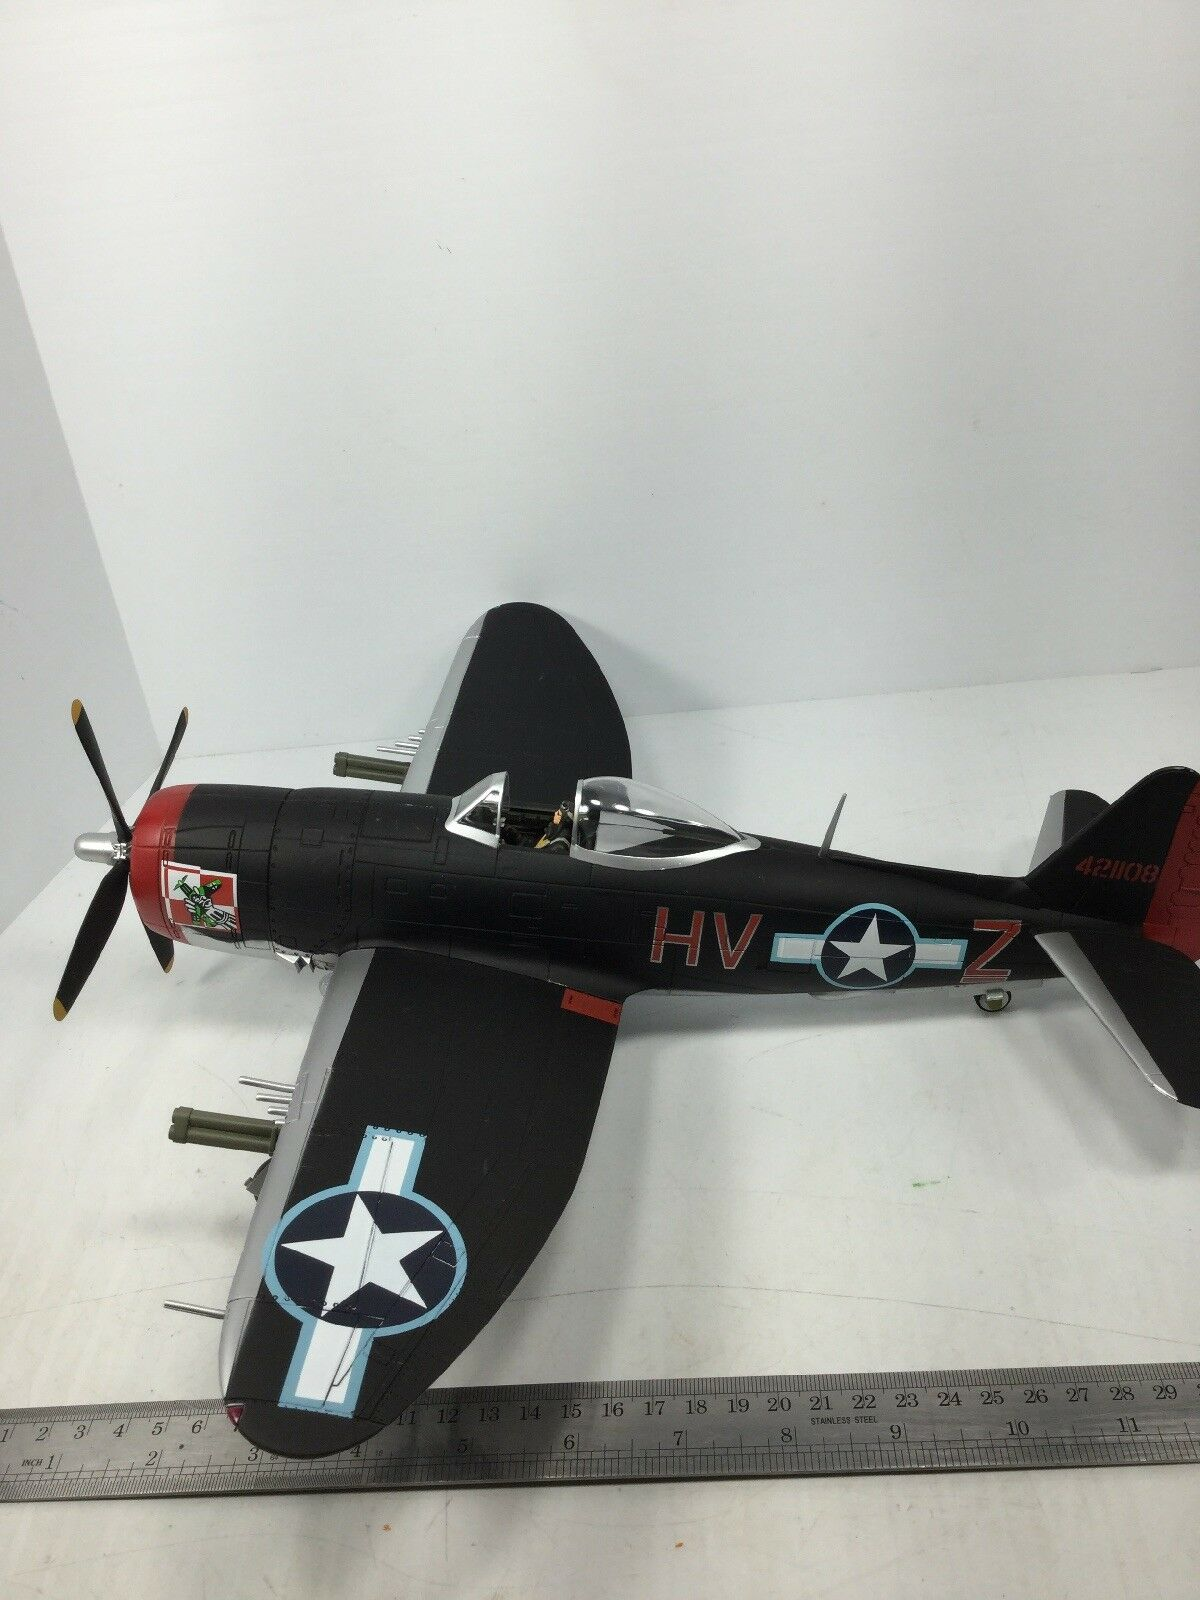 132 SCALA 21ST CENT. Ultimate Soldier United States Air Force P47 D BUBBLE Top Aereo da caccia WW2